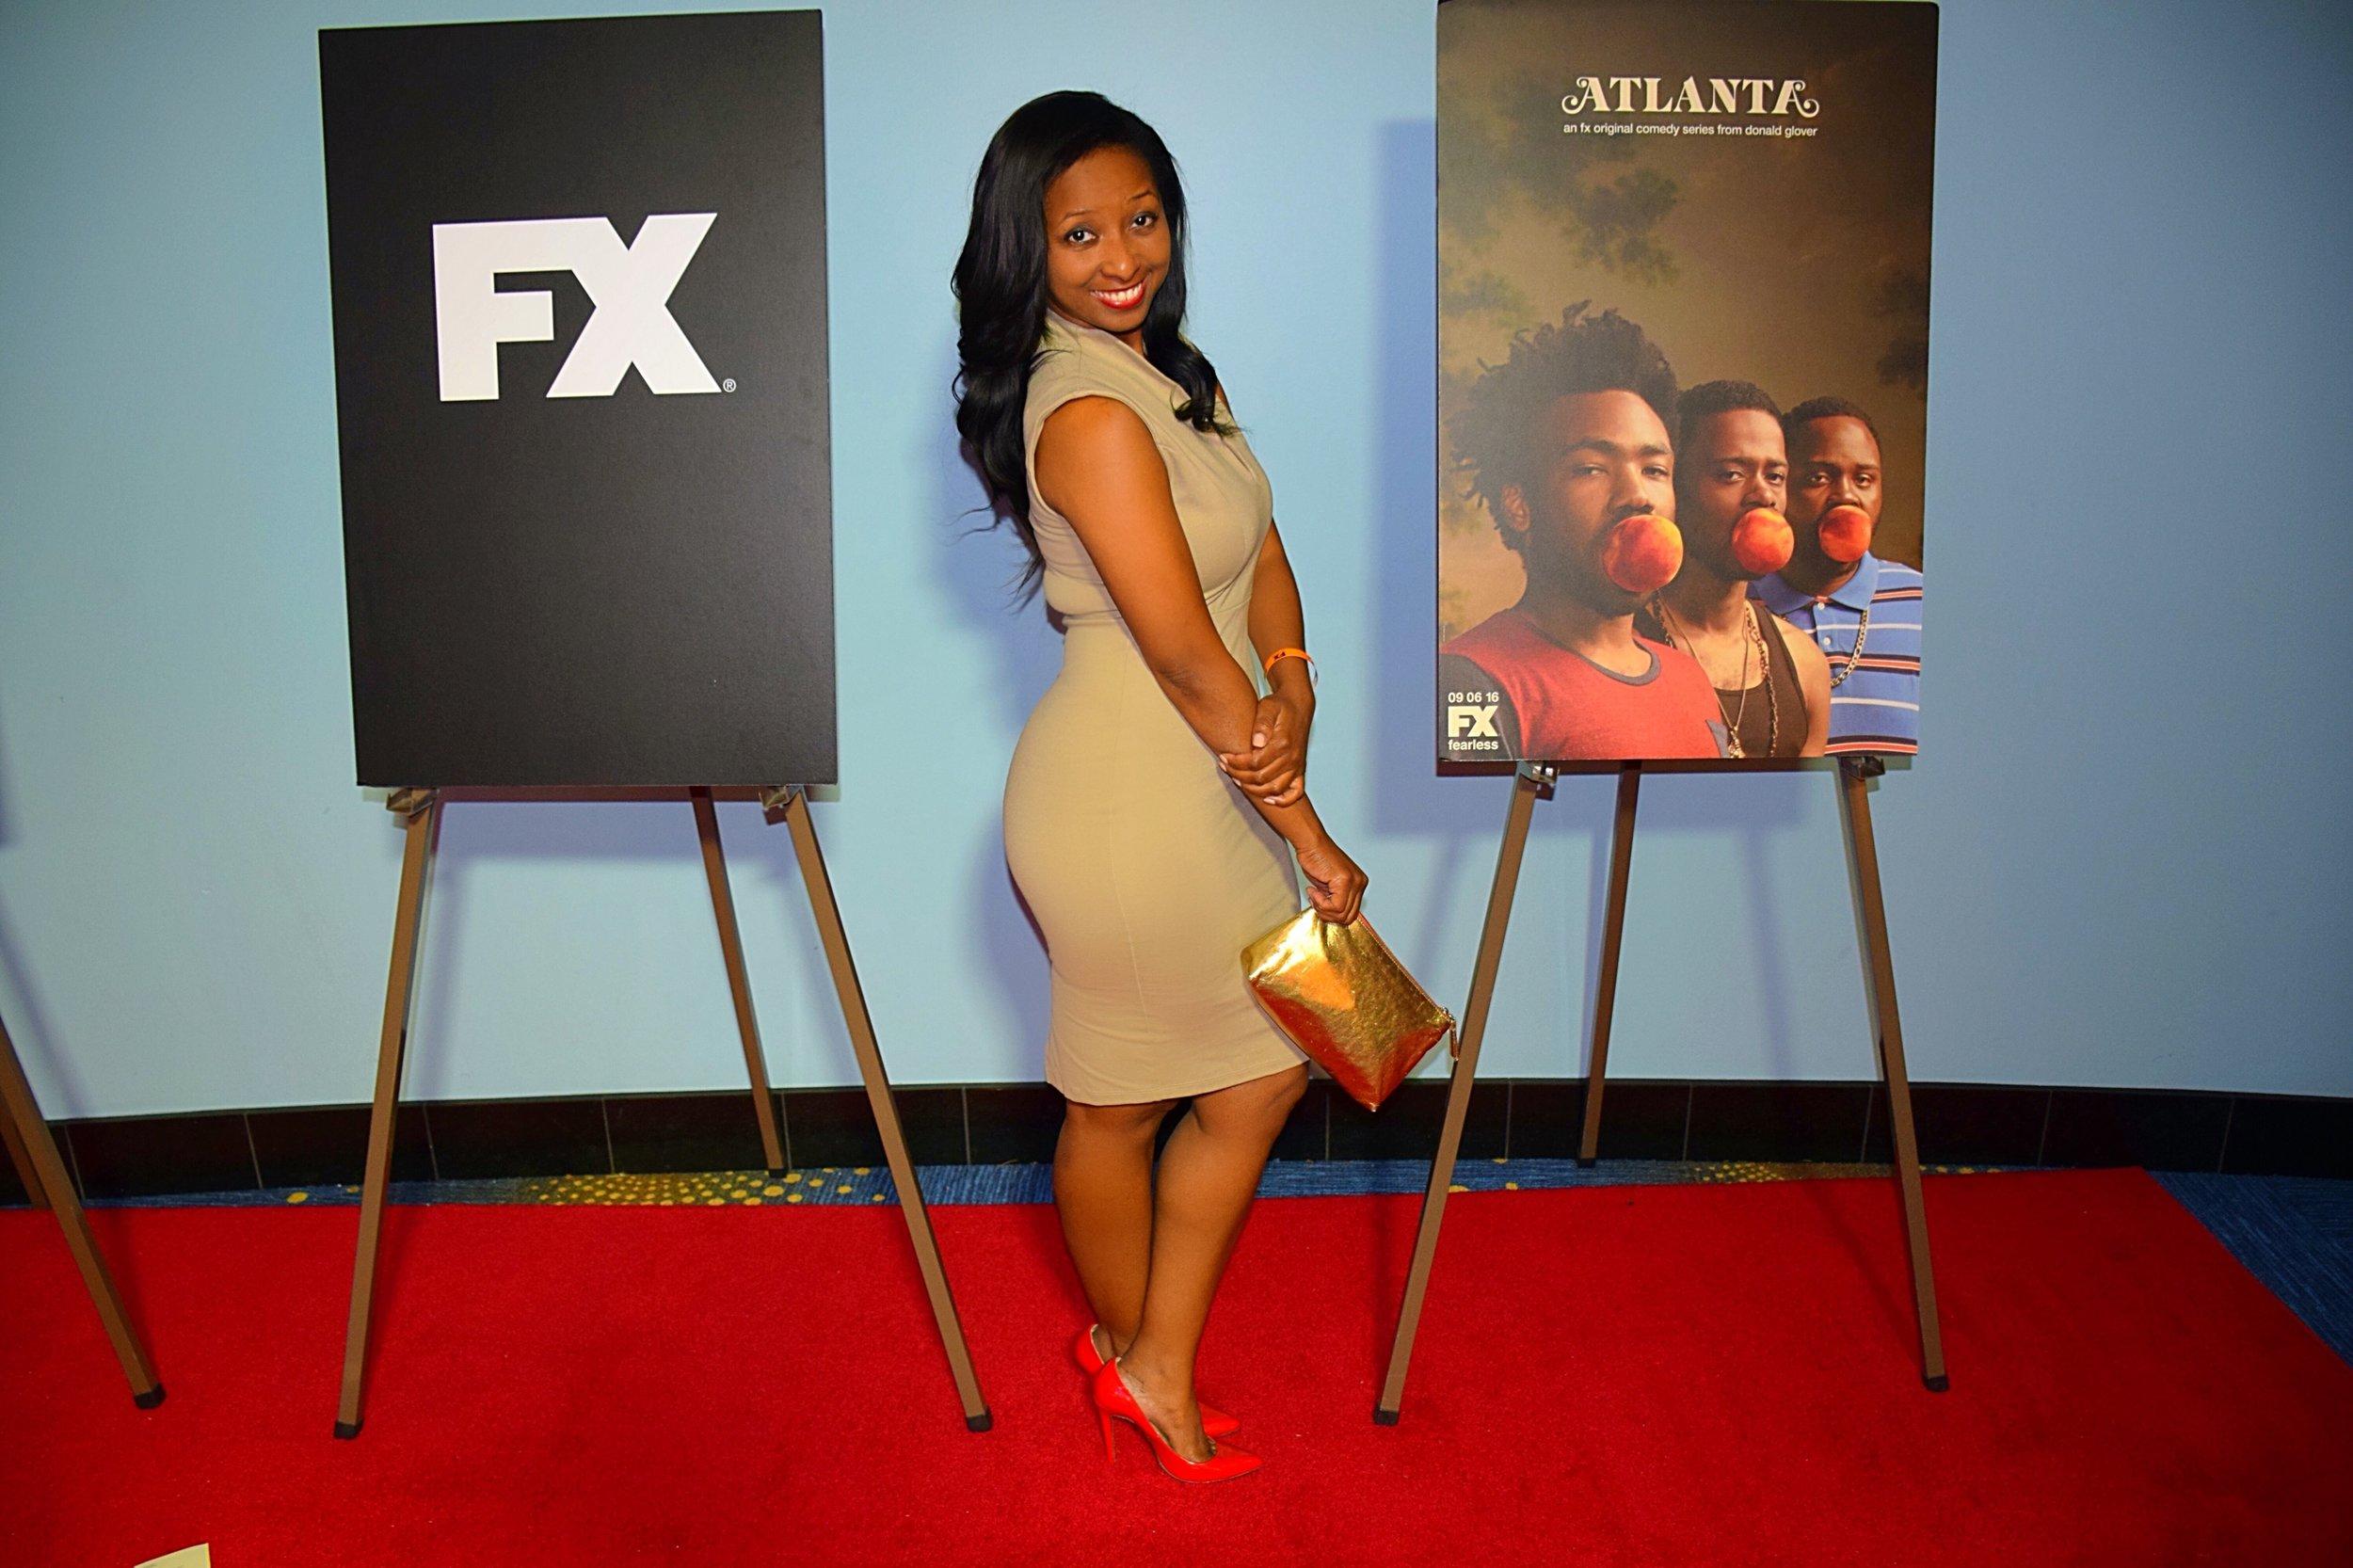 FX red carpet premiere of 'Atlanta'.